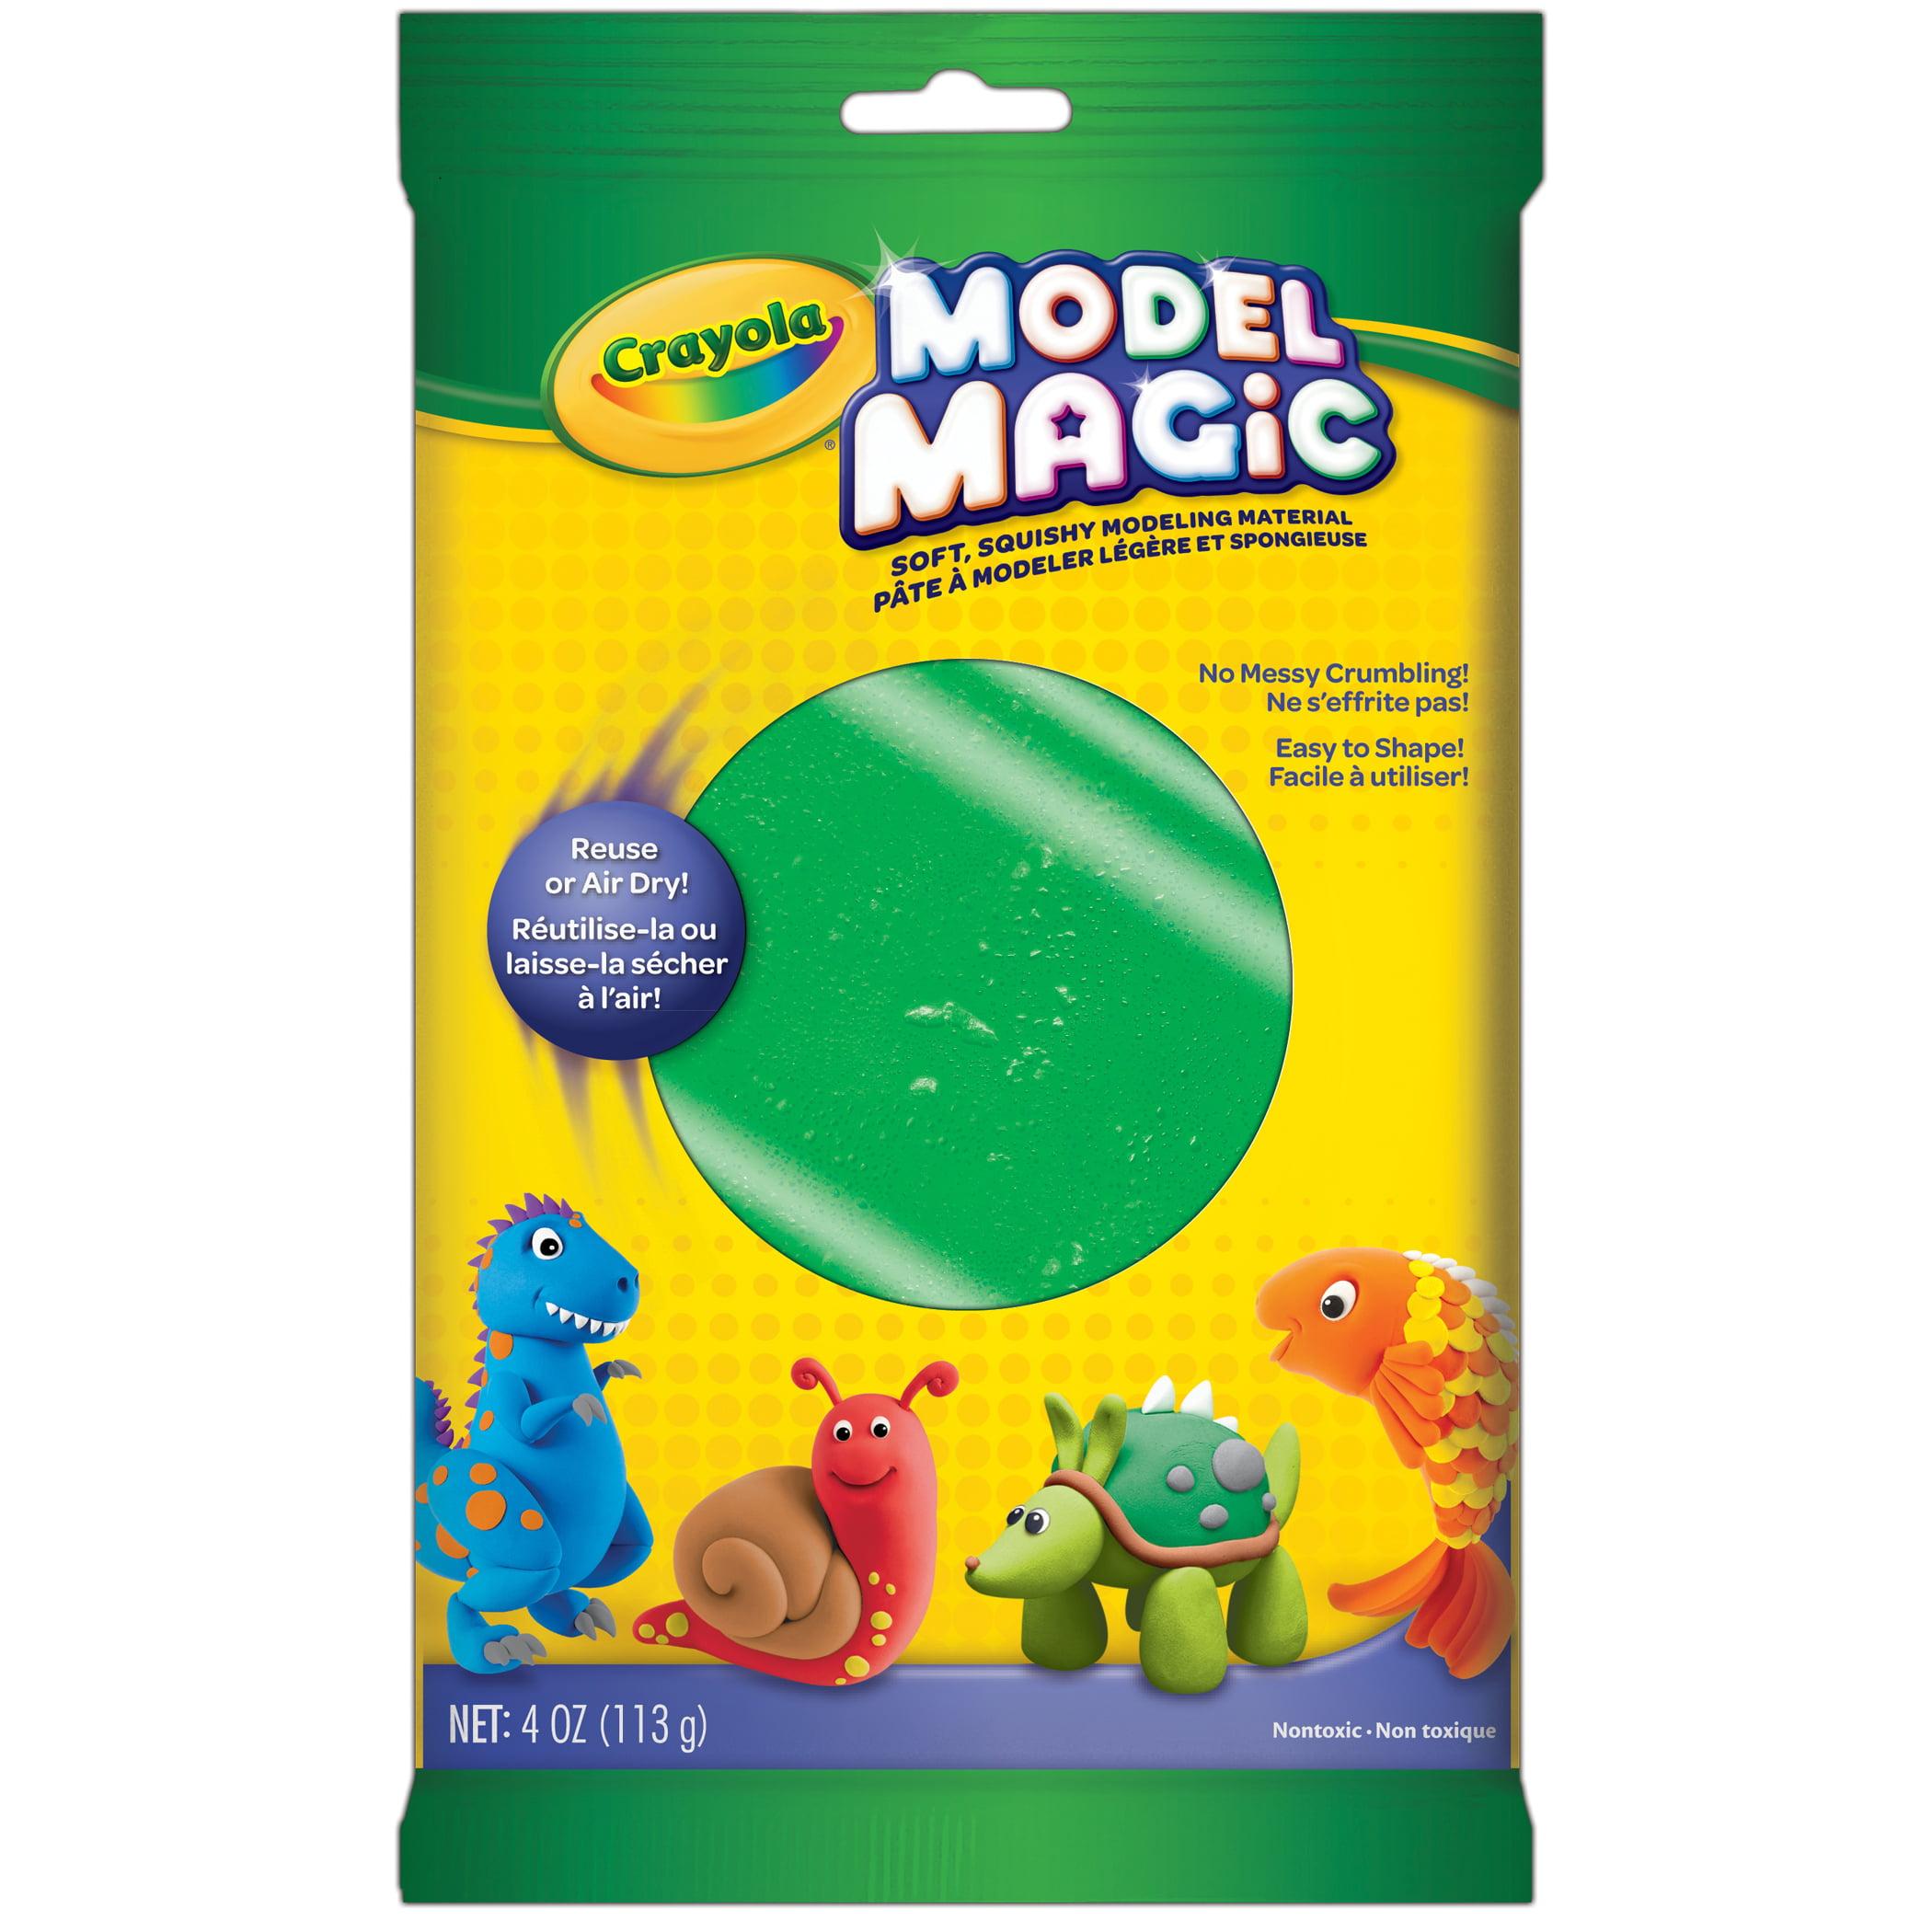 Crayola Model Magic Modeling Compound, Green, 4 Oz Packs, 6 Packs